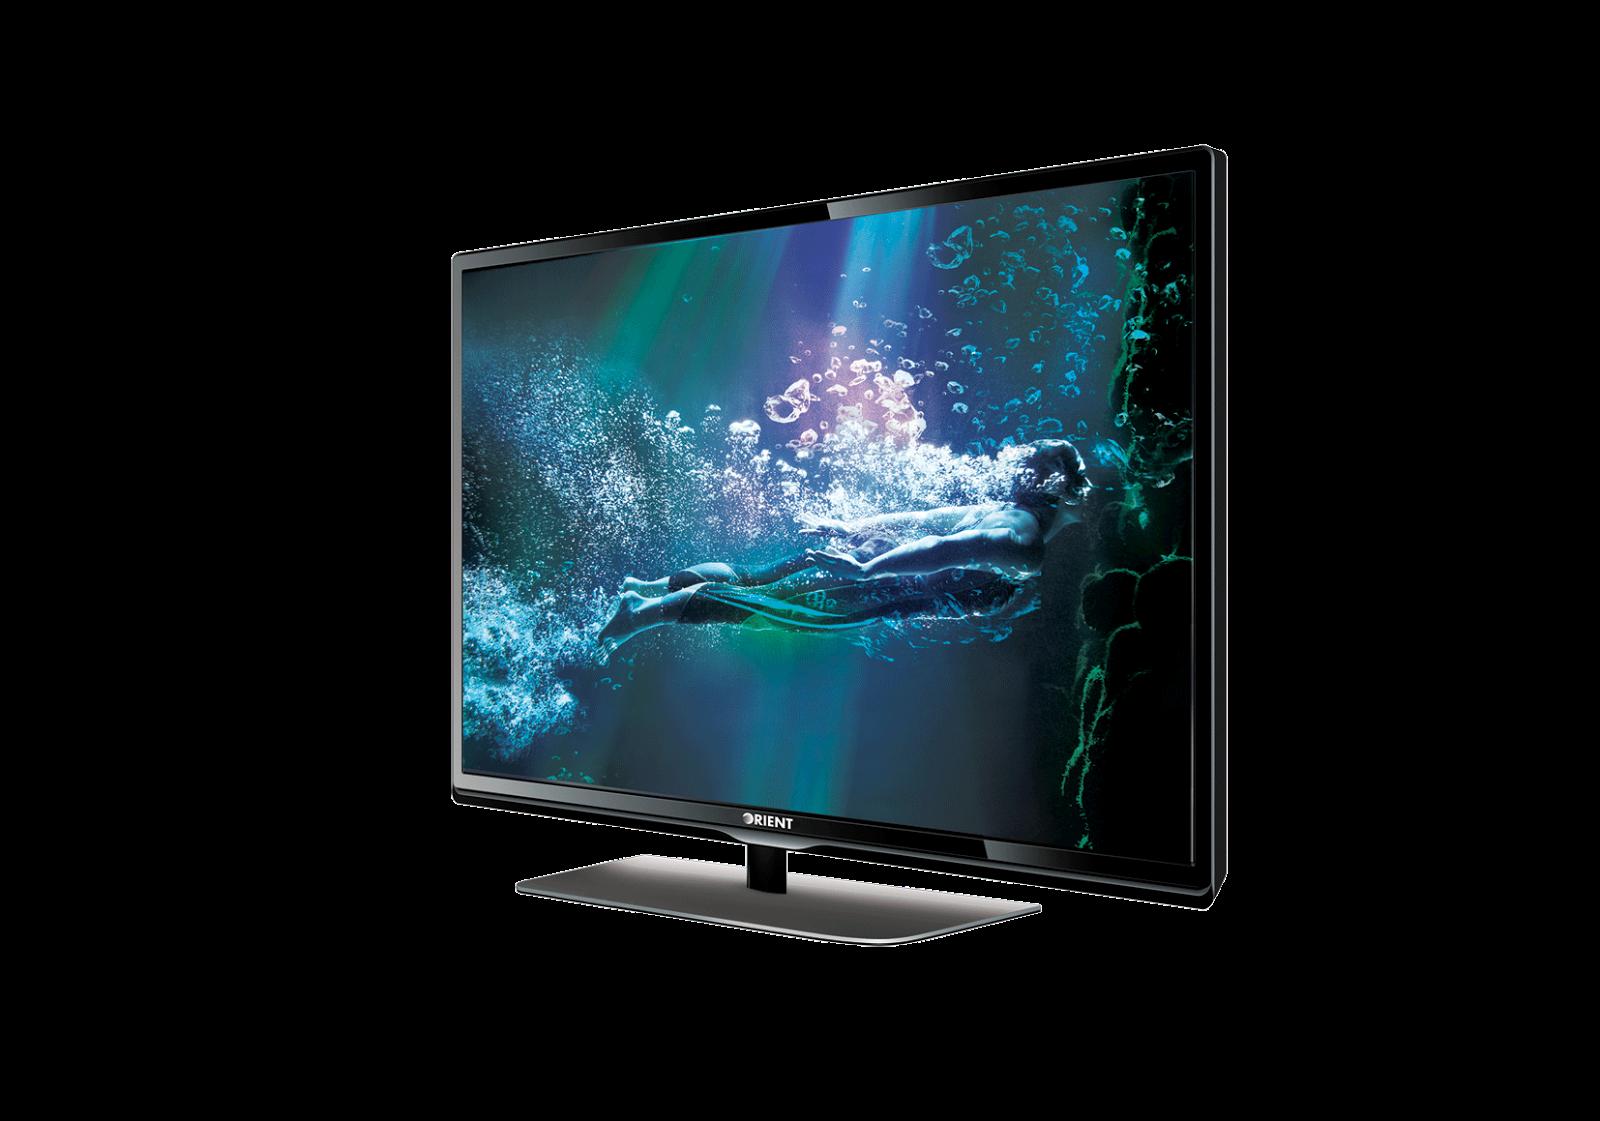 Orient Led Tv